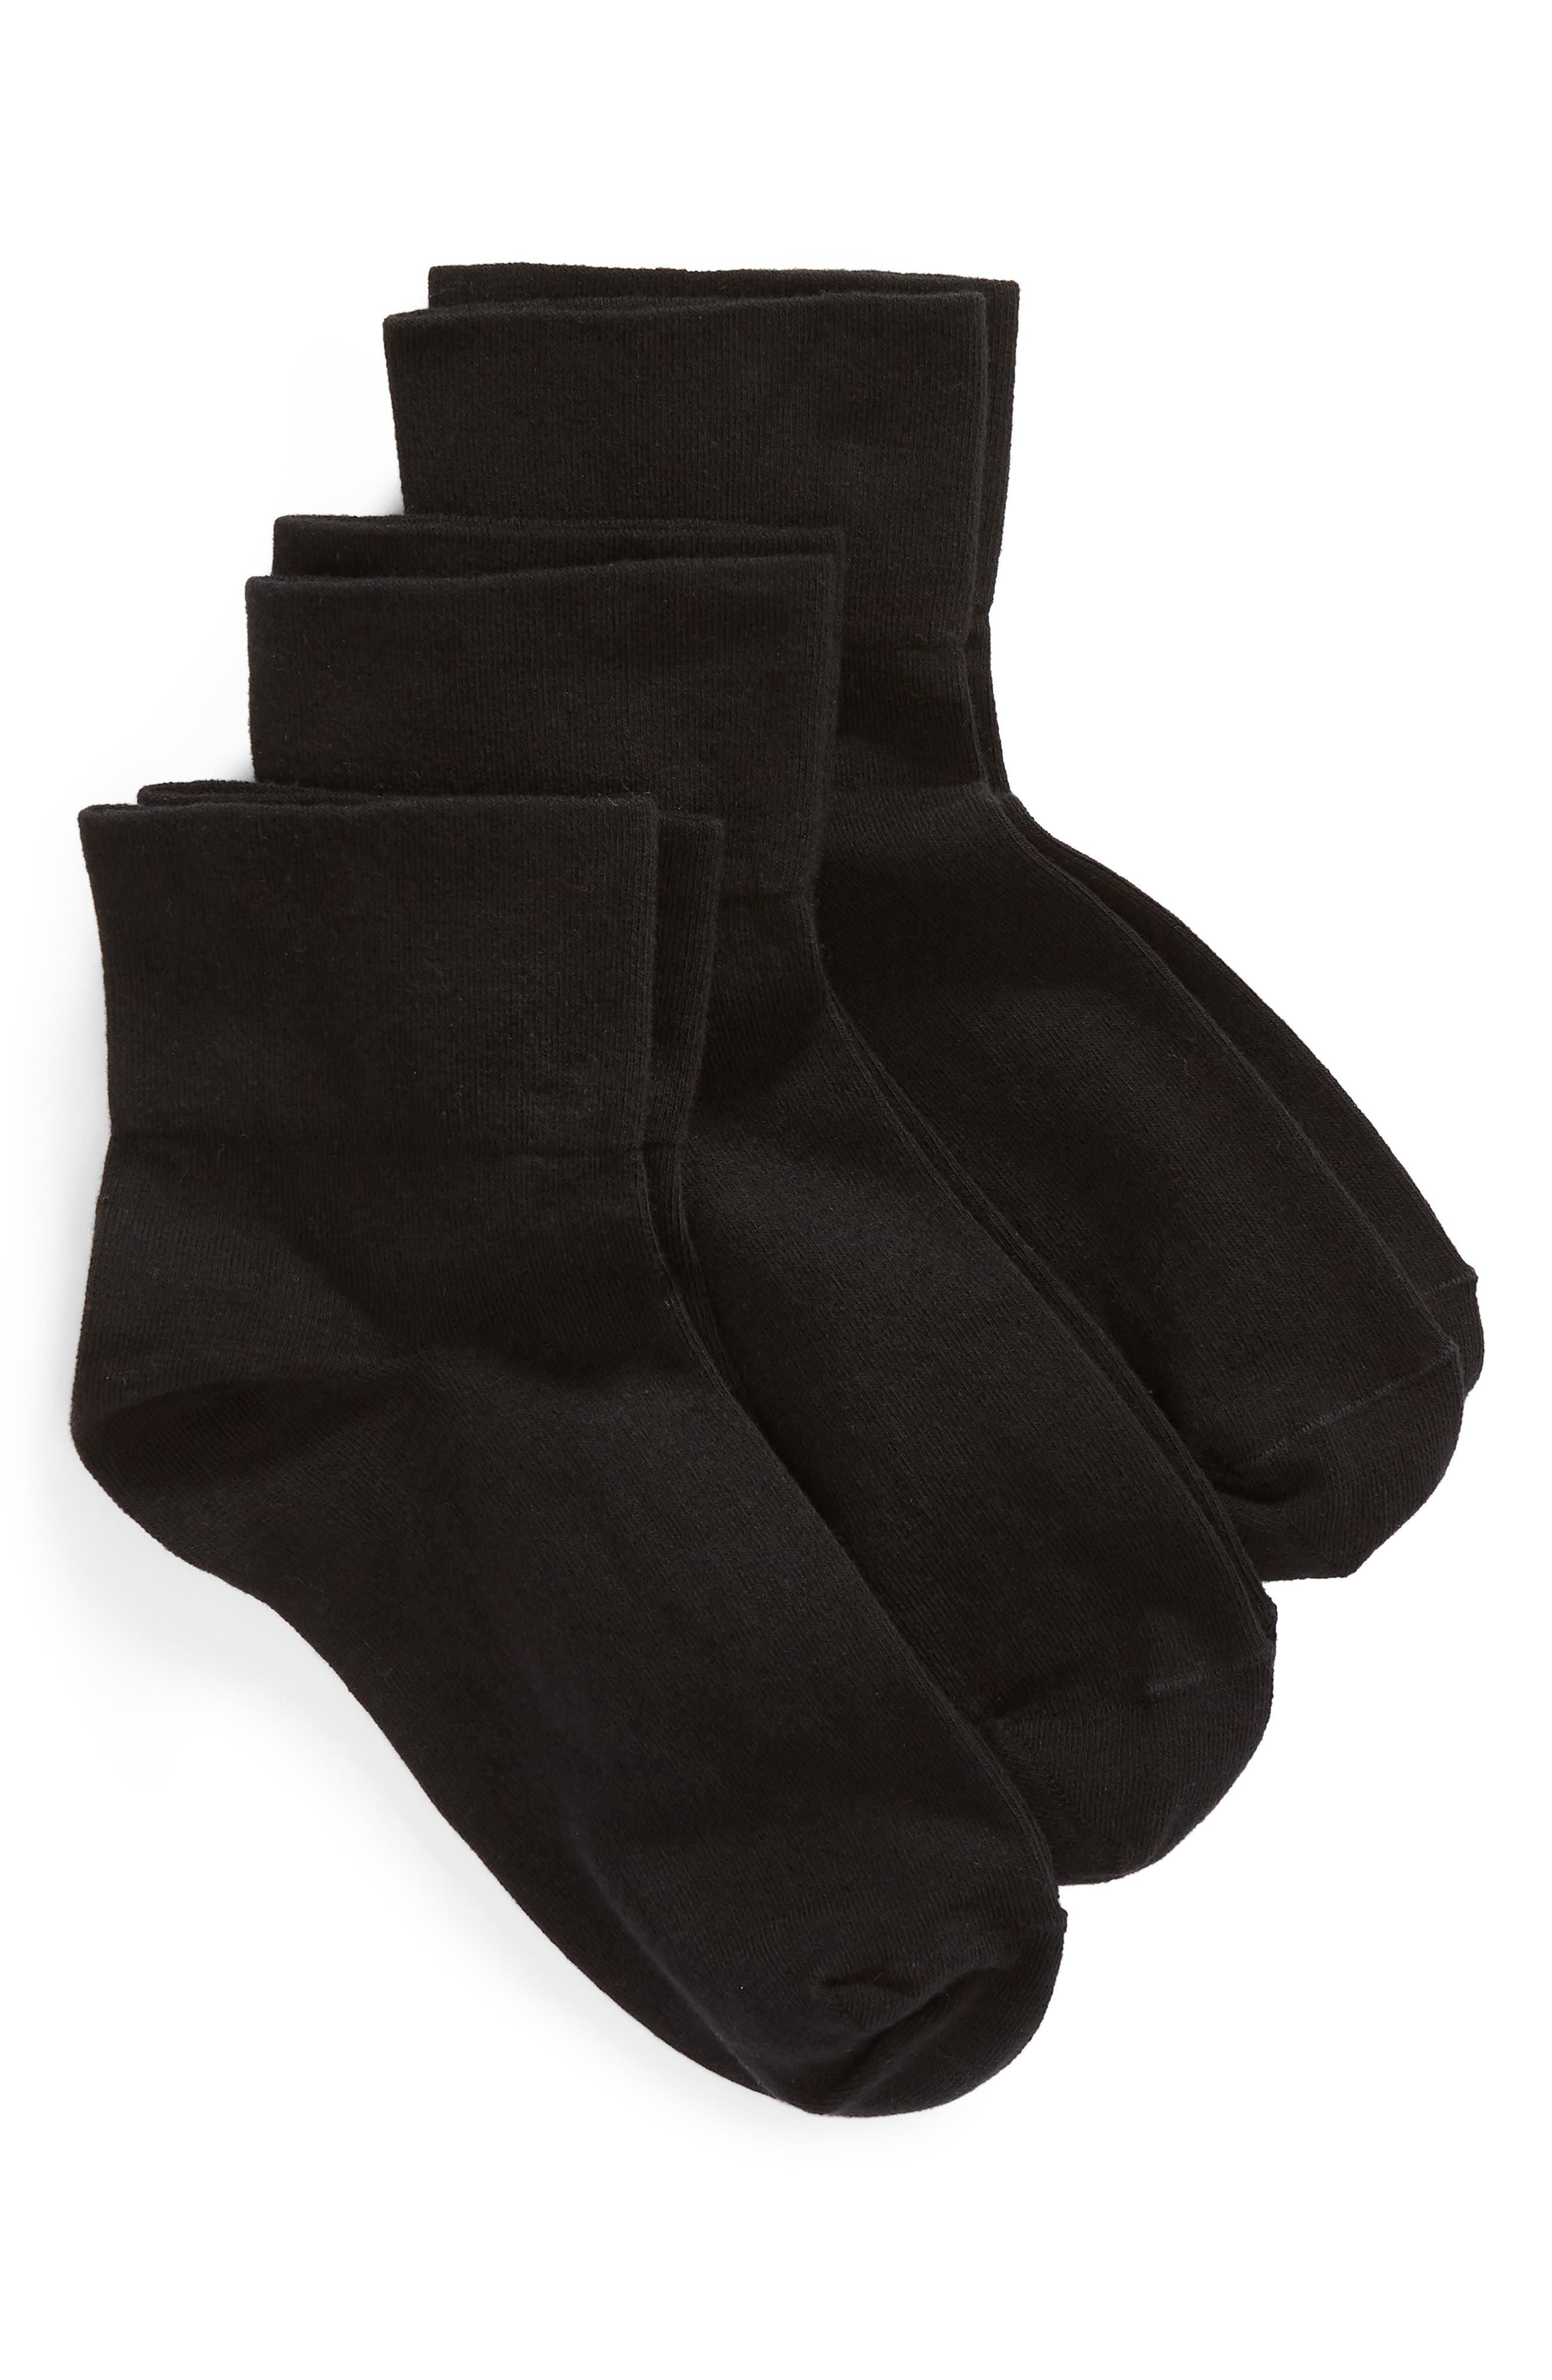 Everyday 3-Pack Ankle Socks,                             Main thumbnail 1, color,                             BLACK